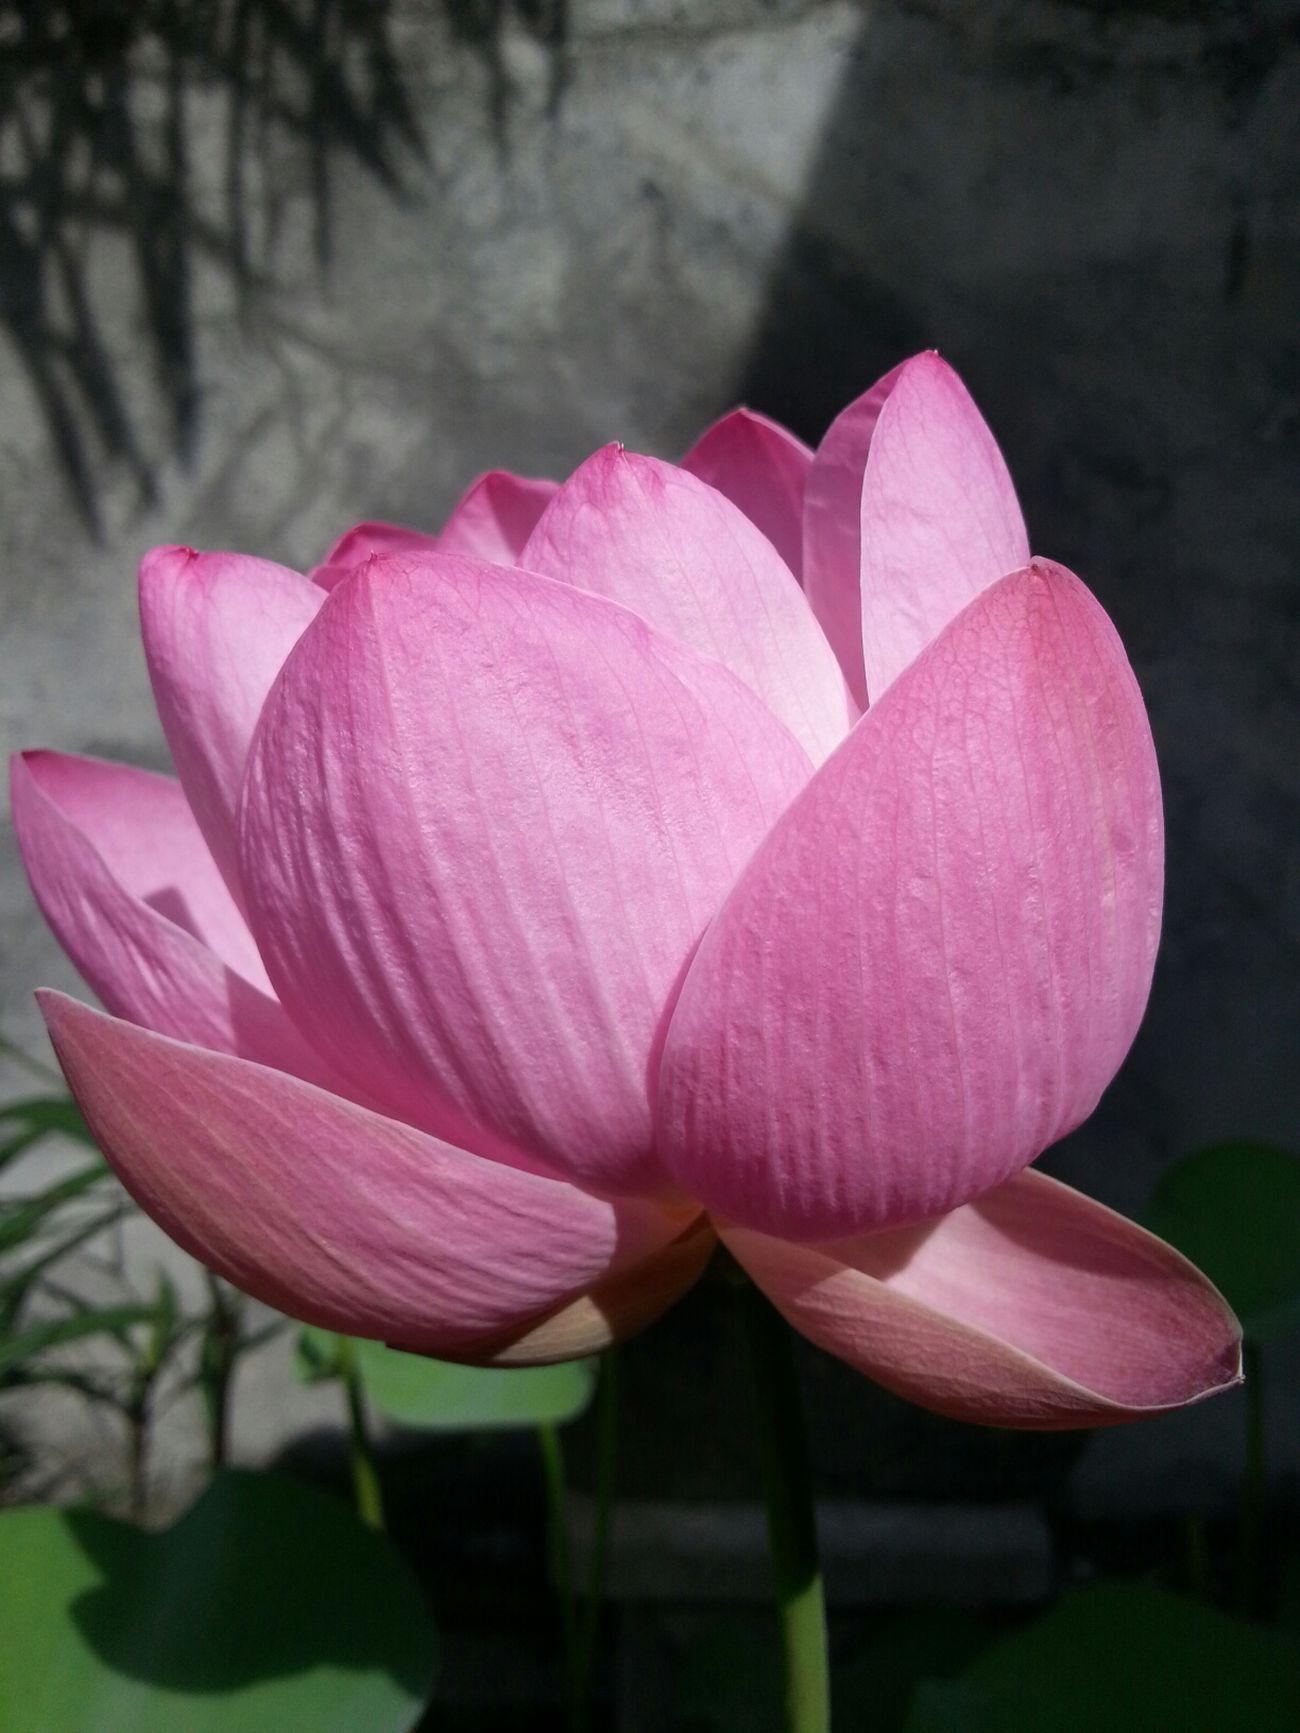 Lotus Flower Bali The Purist (no Edit, No Filter)